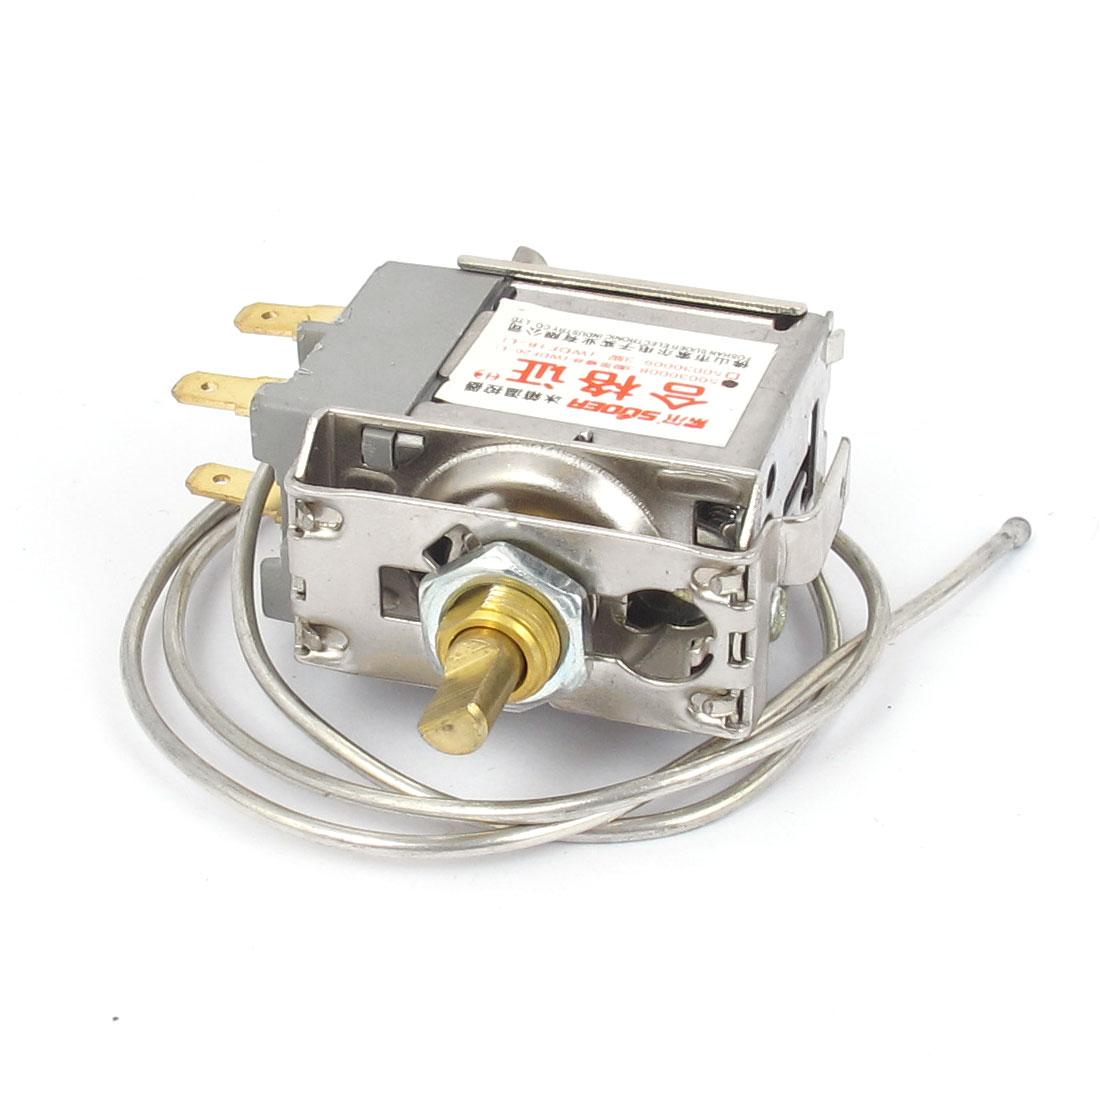 WDF20-L AC 250V 5(4)A 3 Terminals Temperature Controller Refrigerator Thermostat w Cord